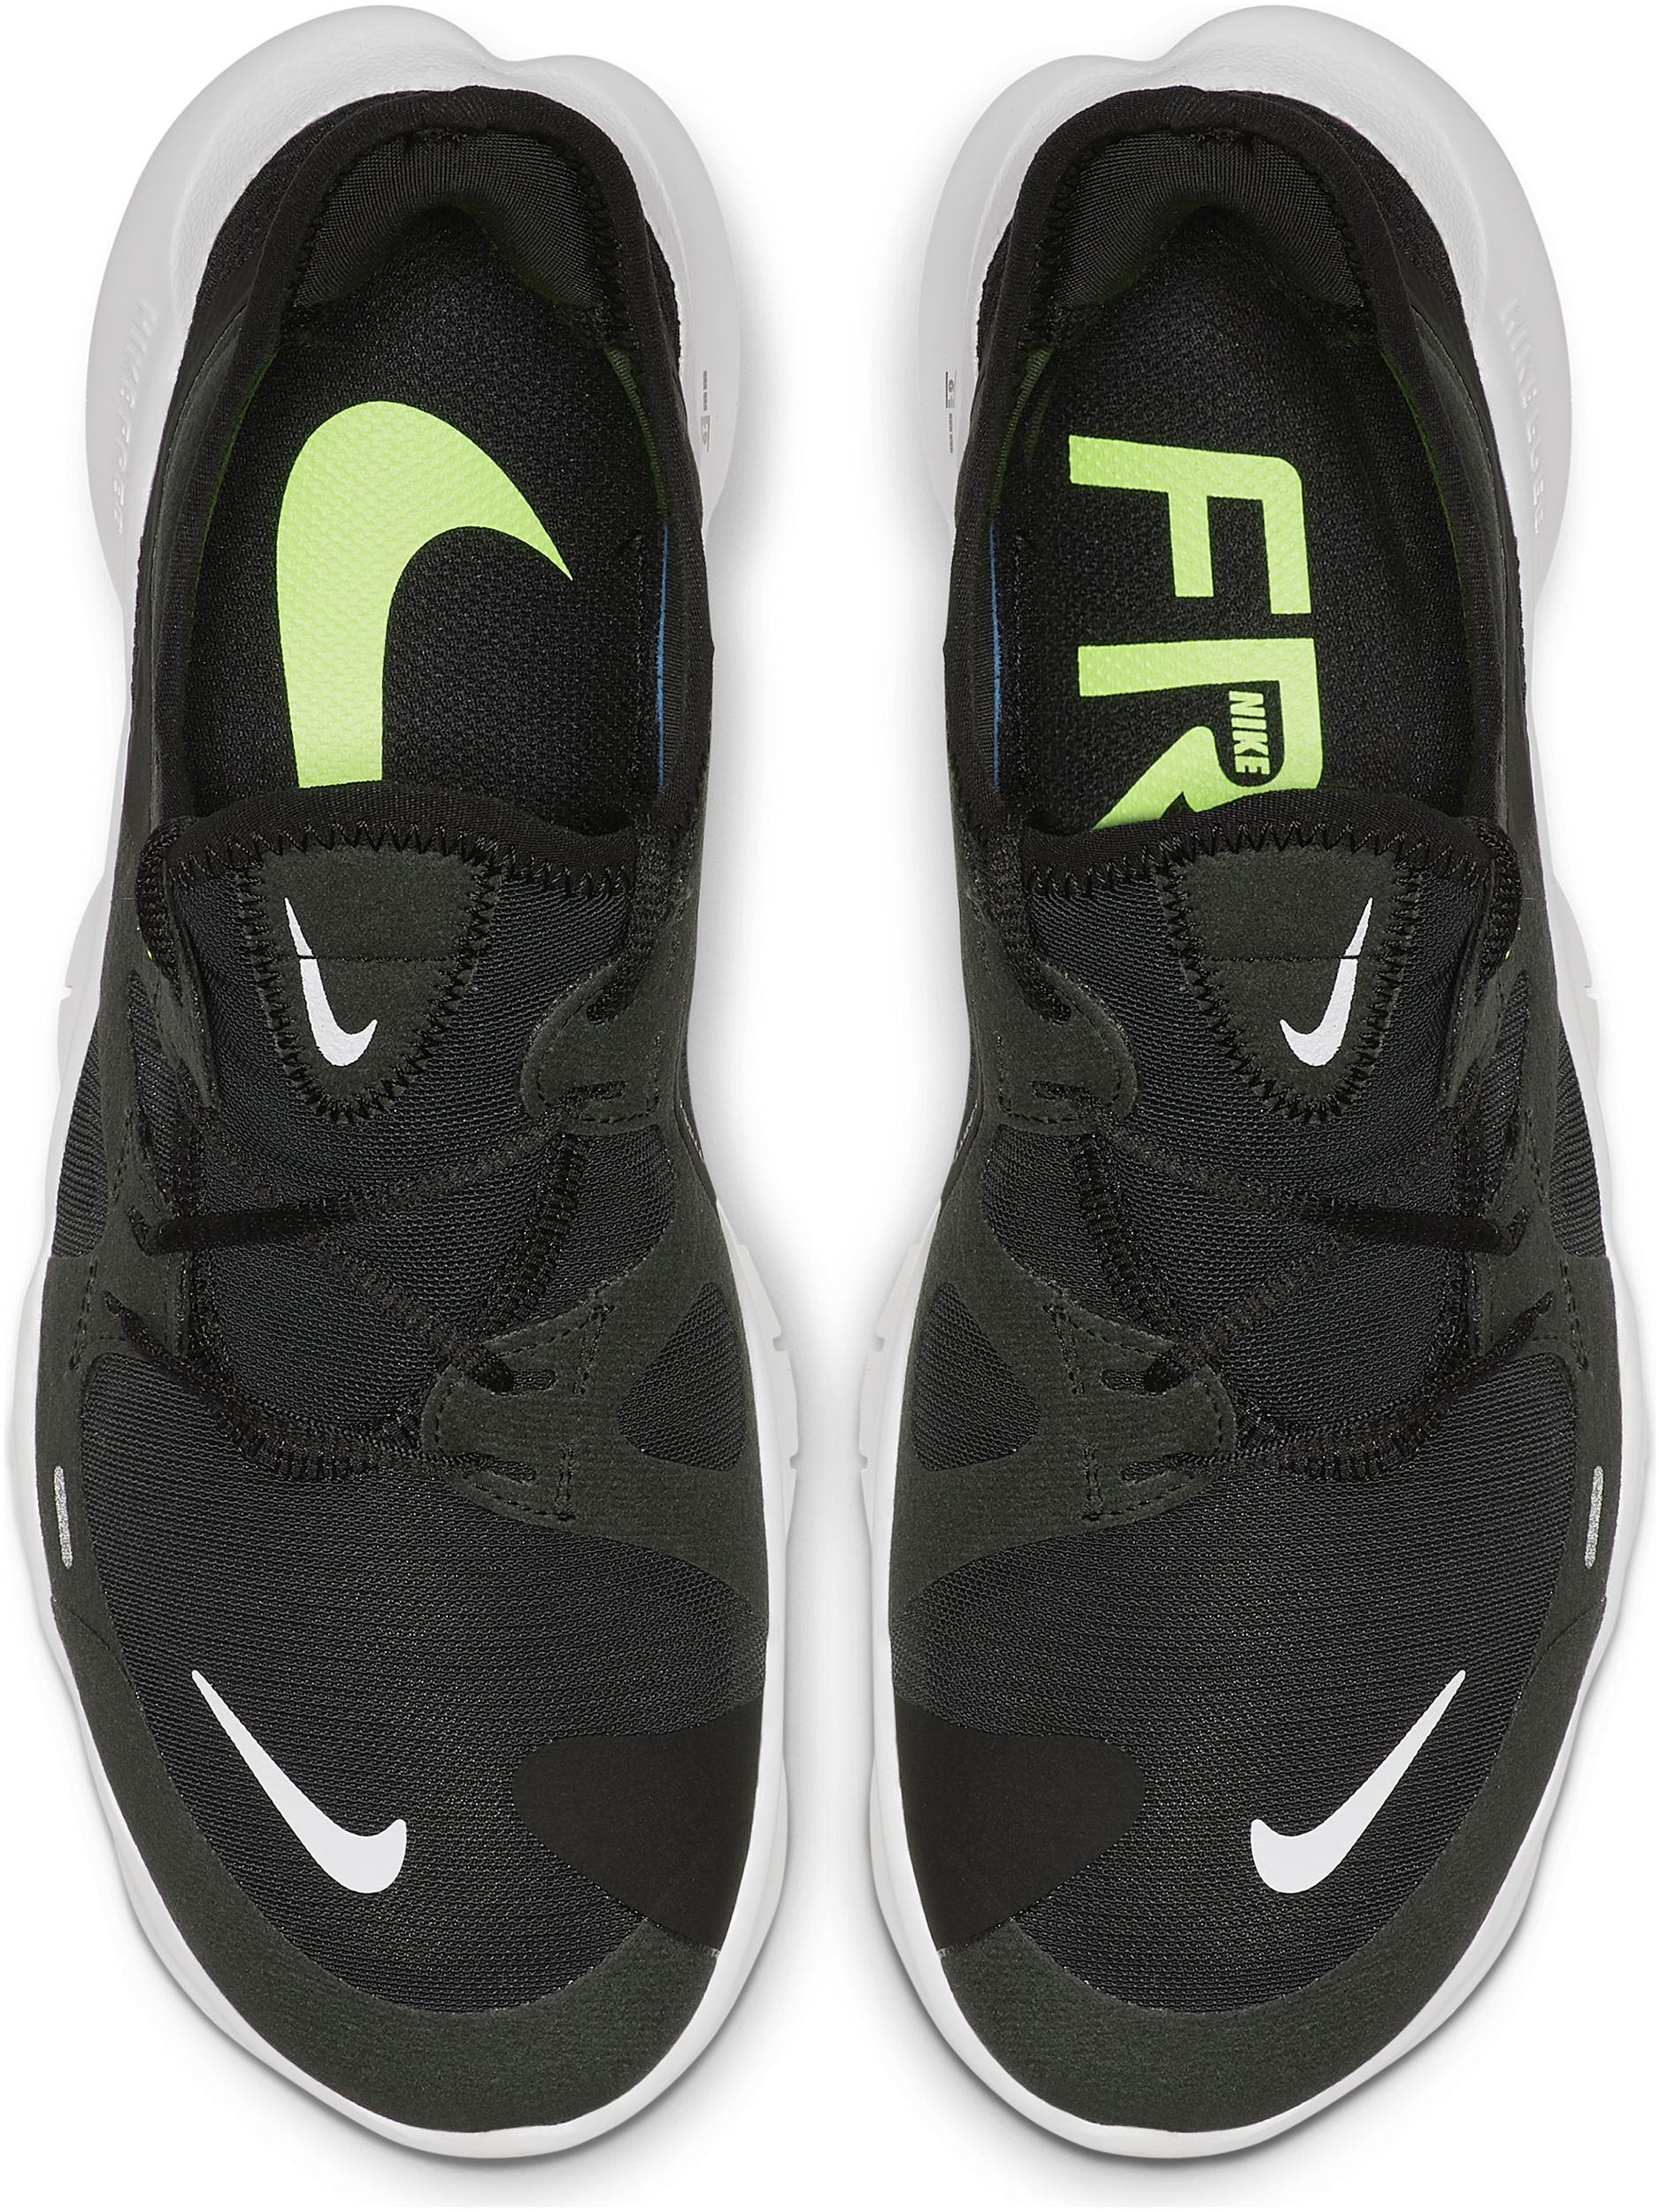 newest 75a7f 54e46 Nike Free Run 5.0 Road Running Shoes - Women s   MEC